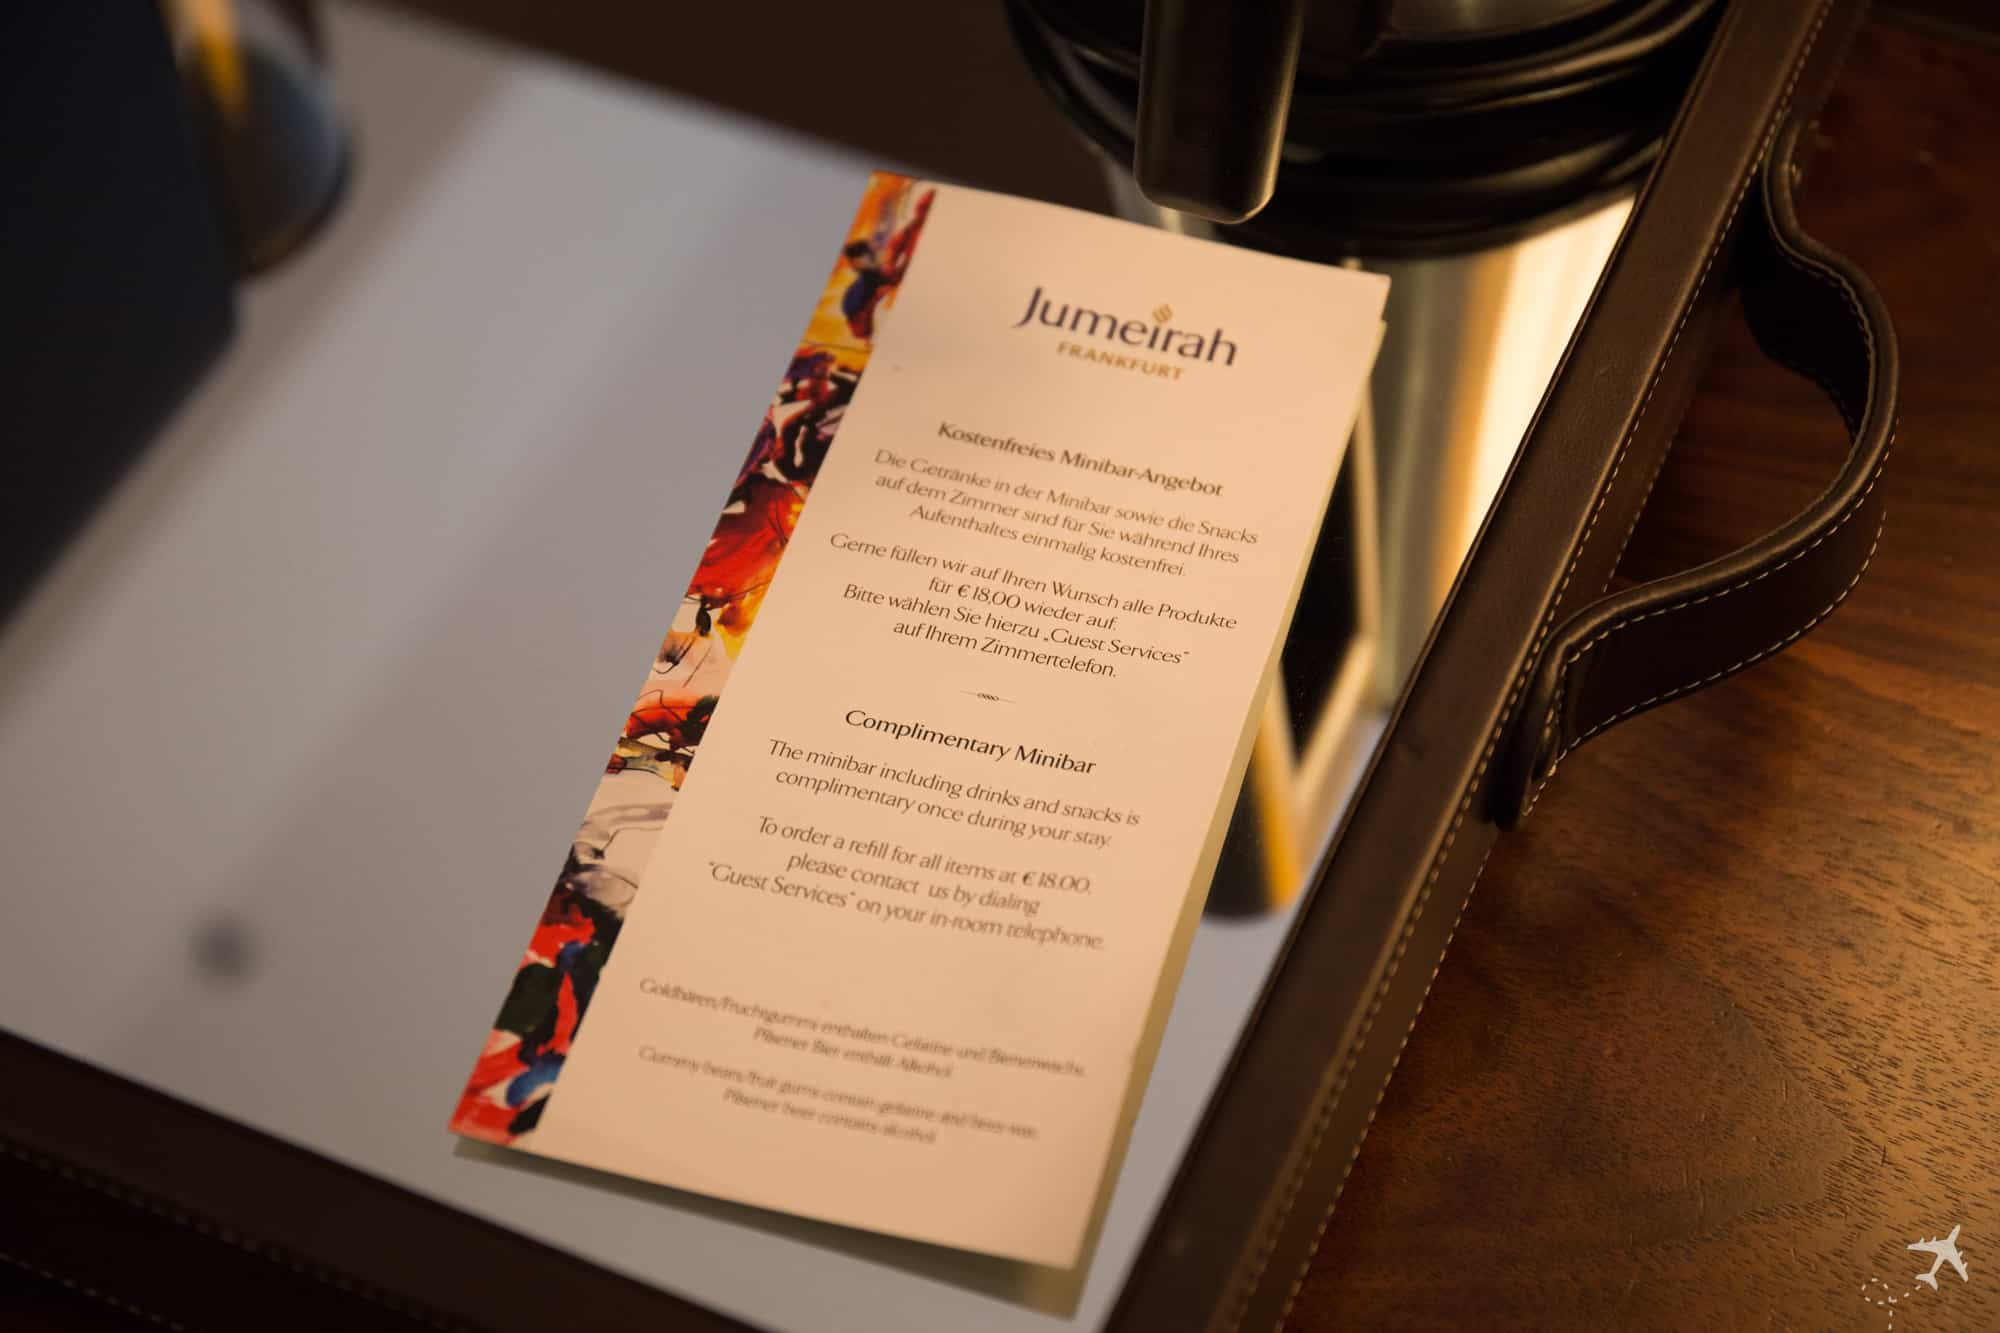 Jumeirah Hotel Frankfurt Kostenfreie Minibar